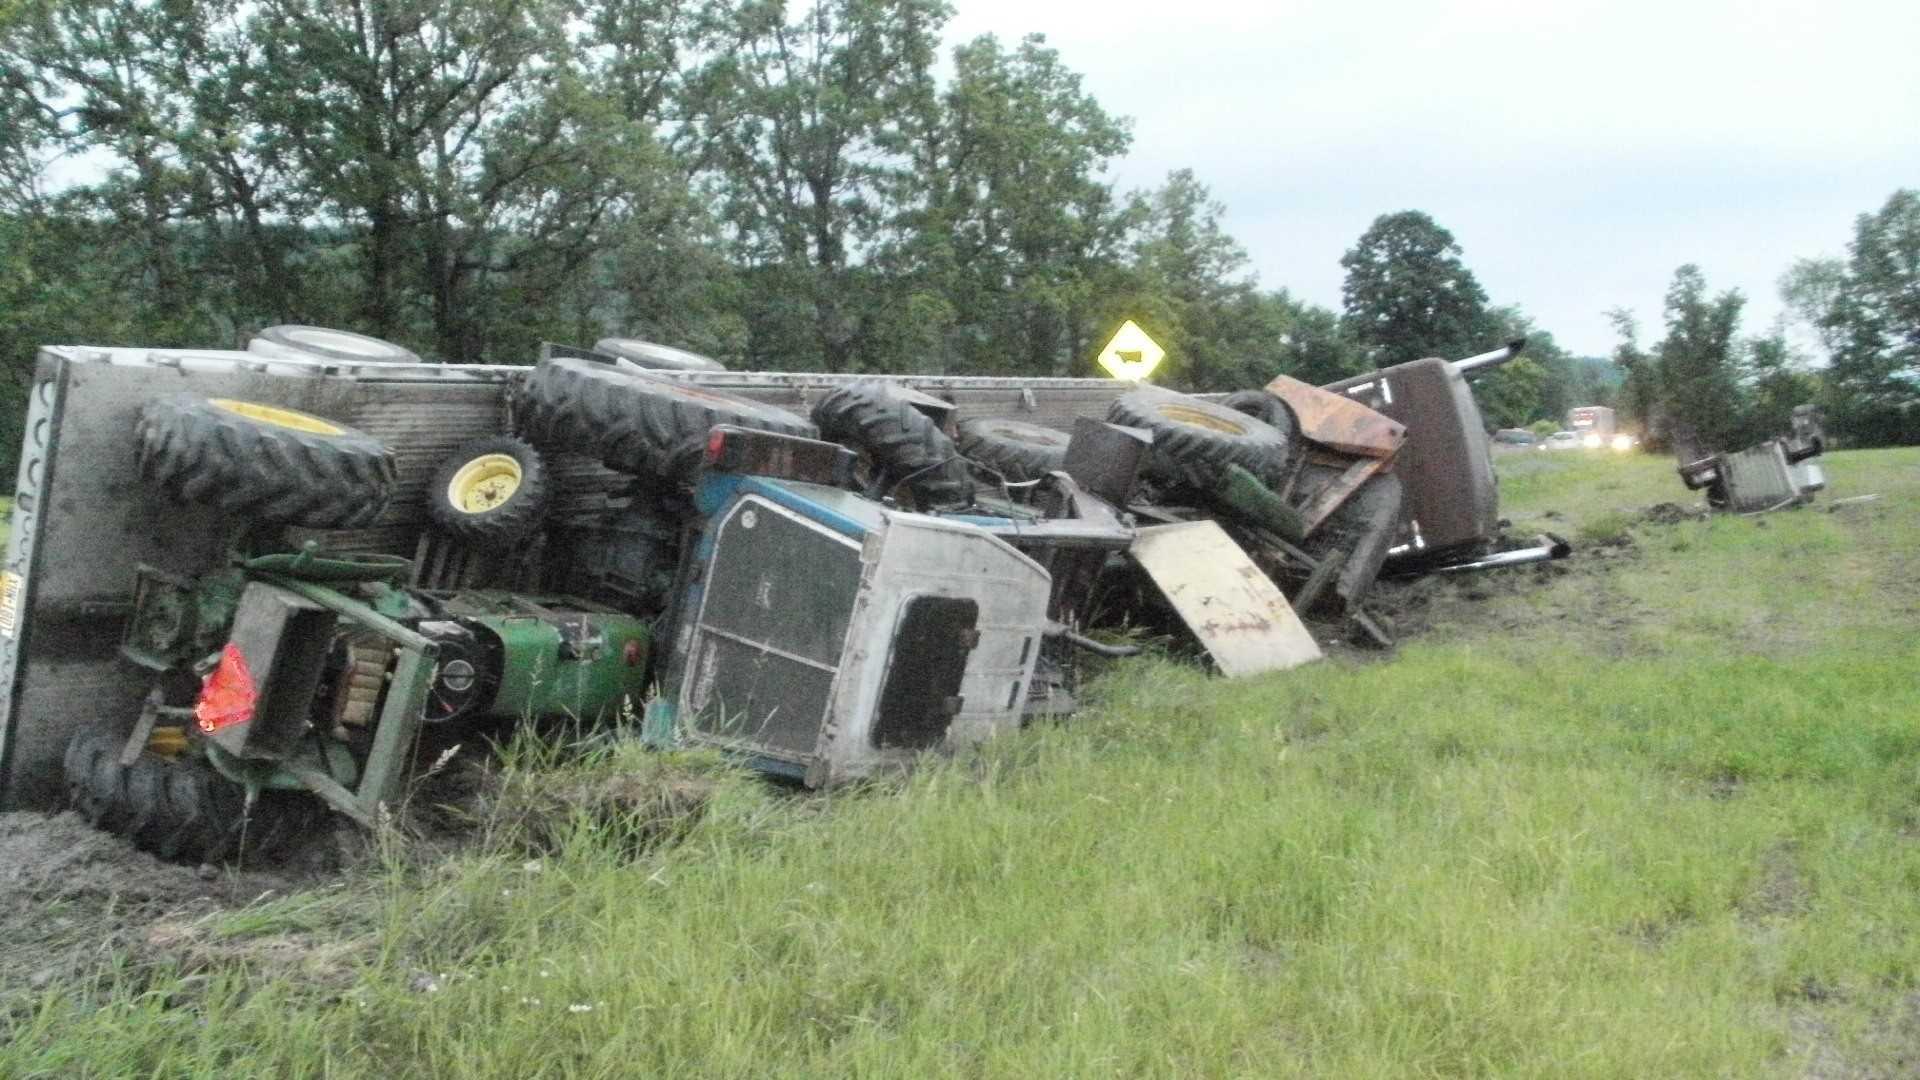 Man uninjured after tractor-trailer crash in Benson, Vt.